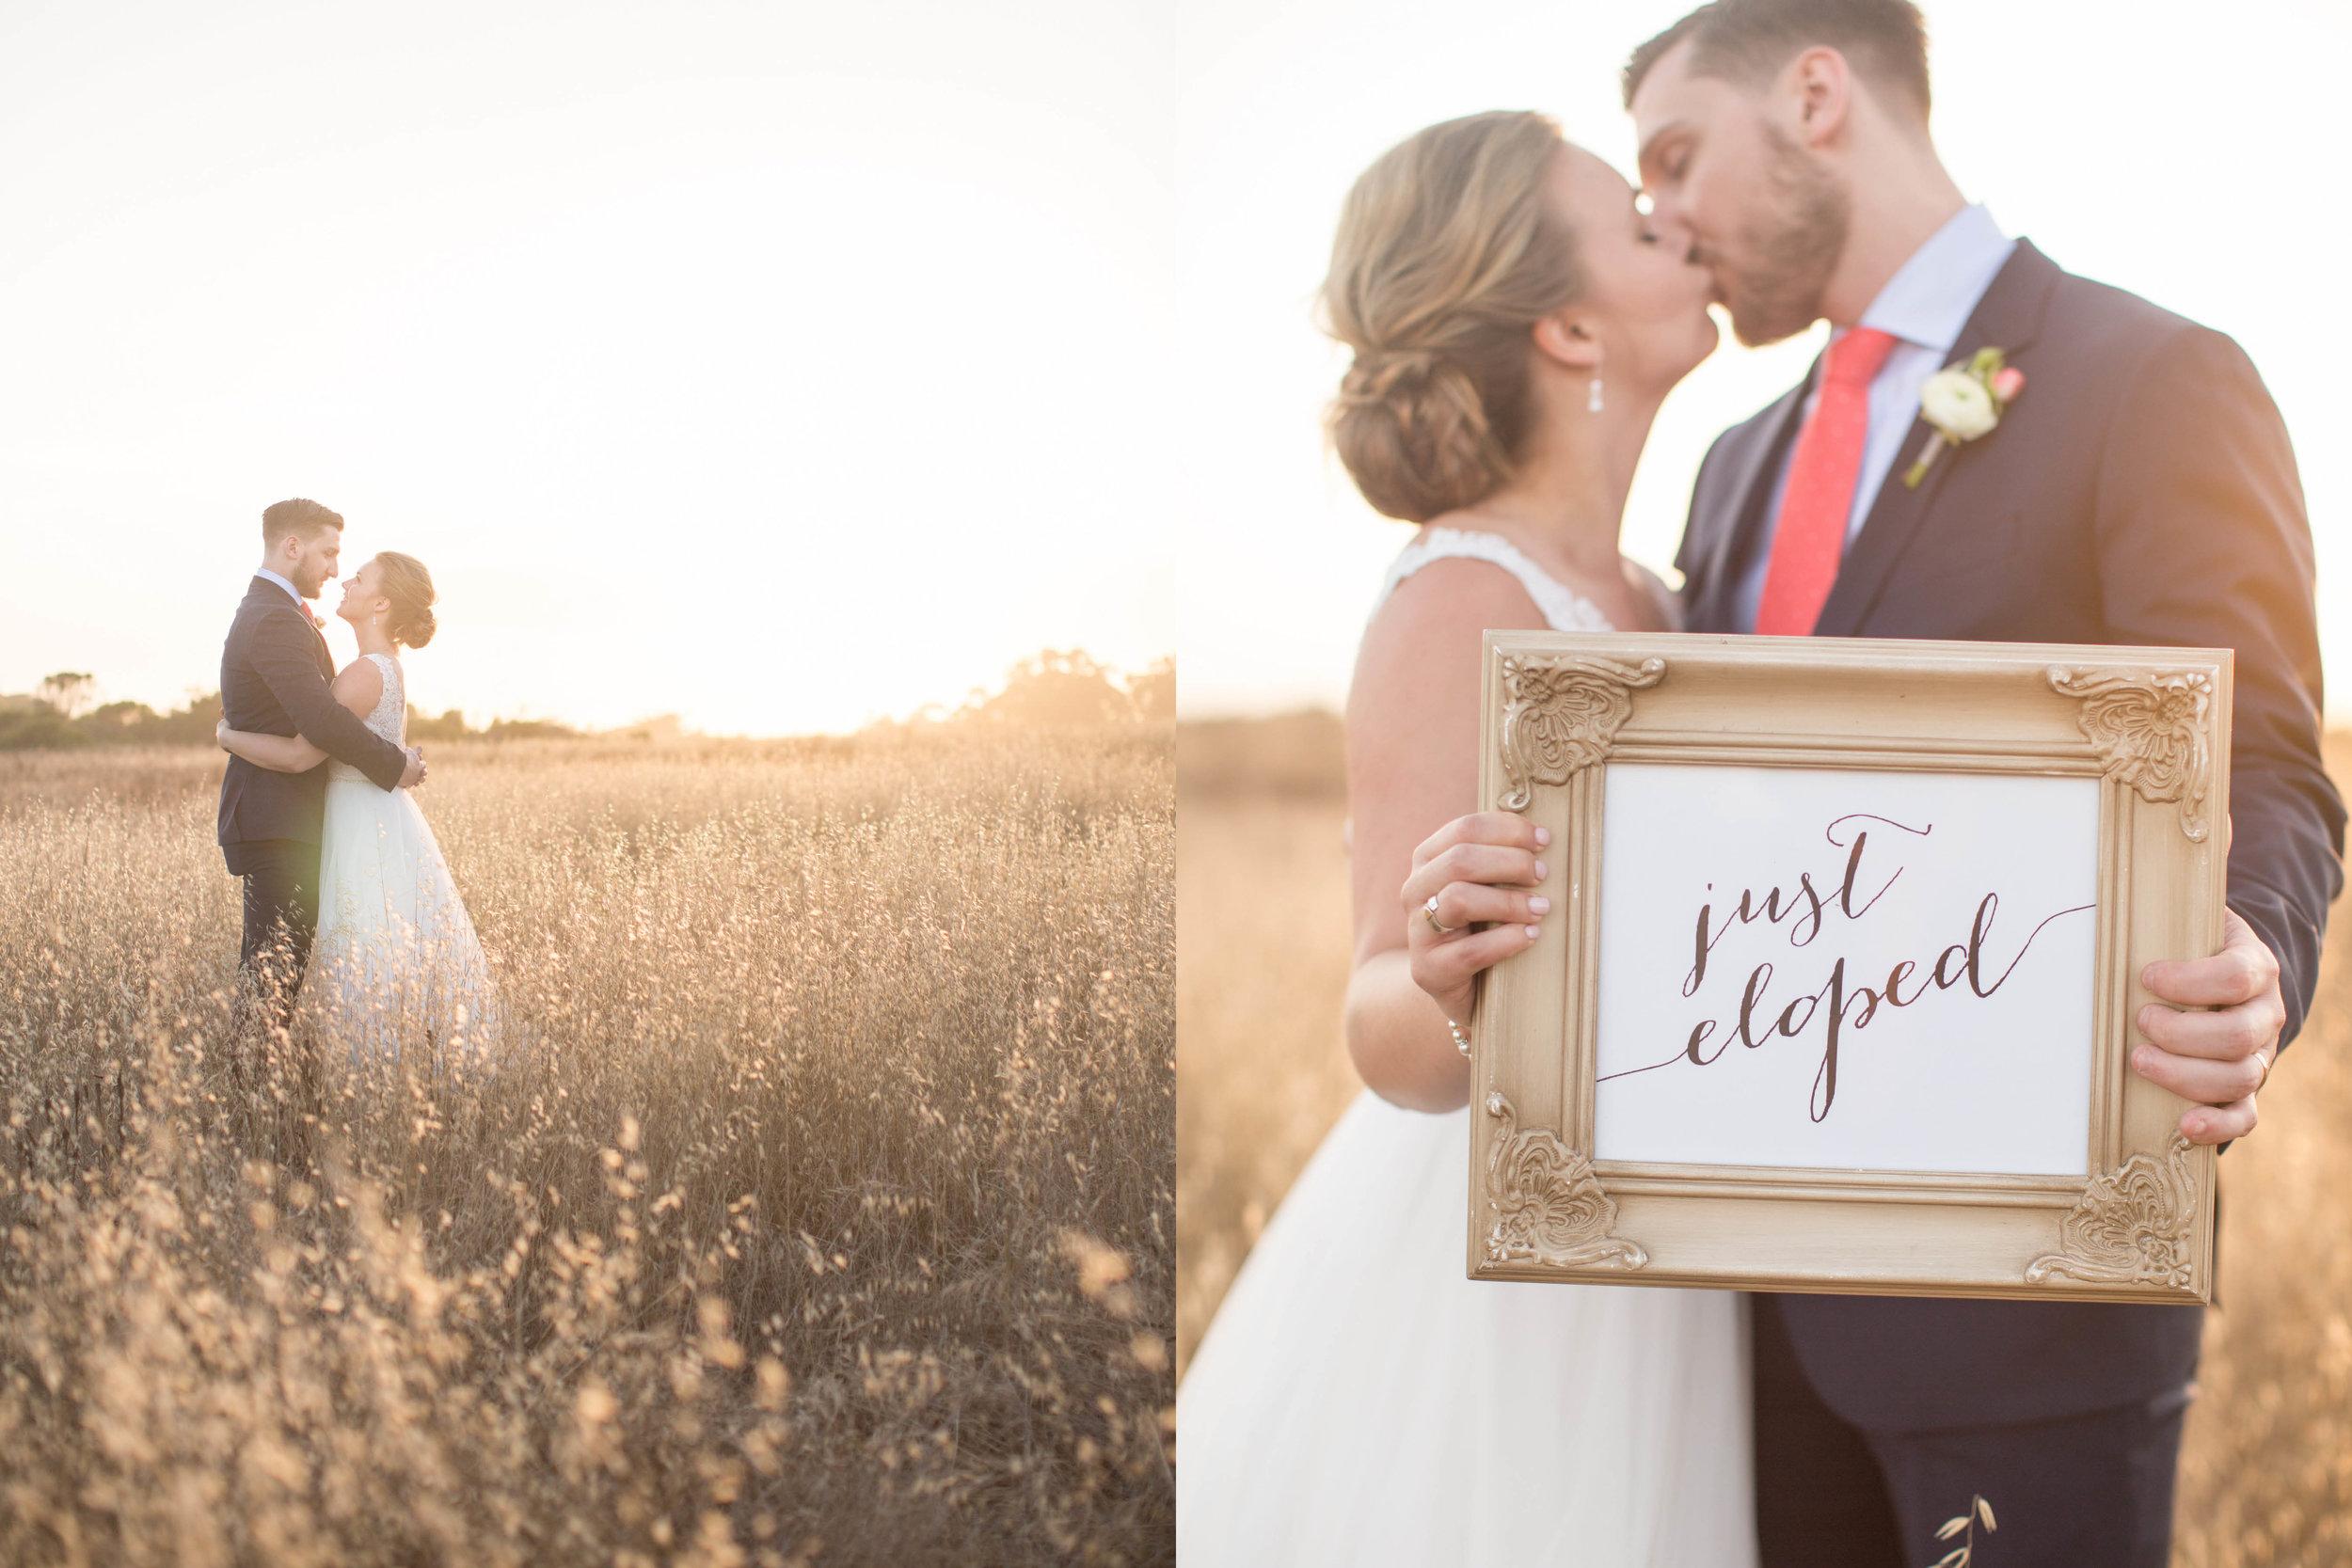 santa-barbara-elopement-elope-wedding-planning-planner-coordinator-day-of-rustic-ellwood-bluffs-beach-front-ocean-view (13).jpg